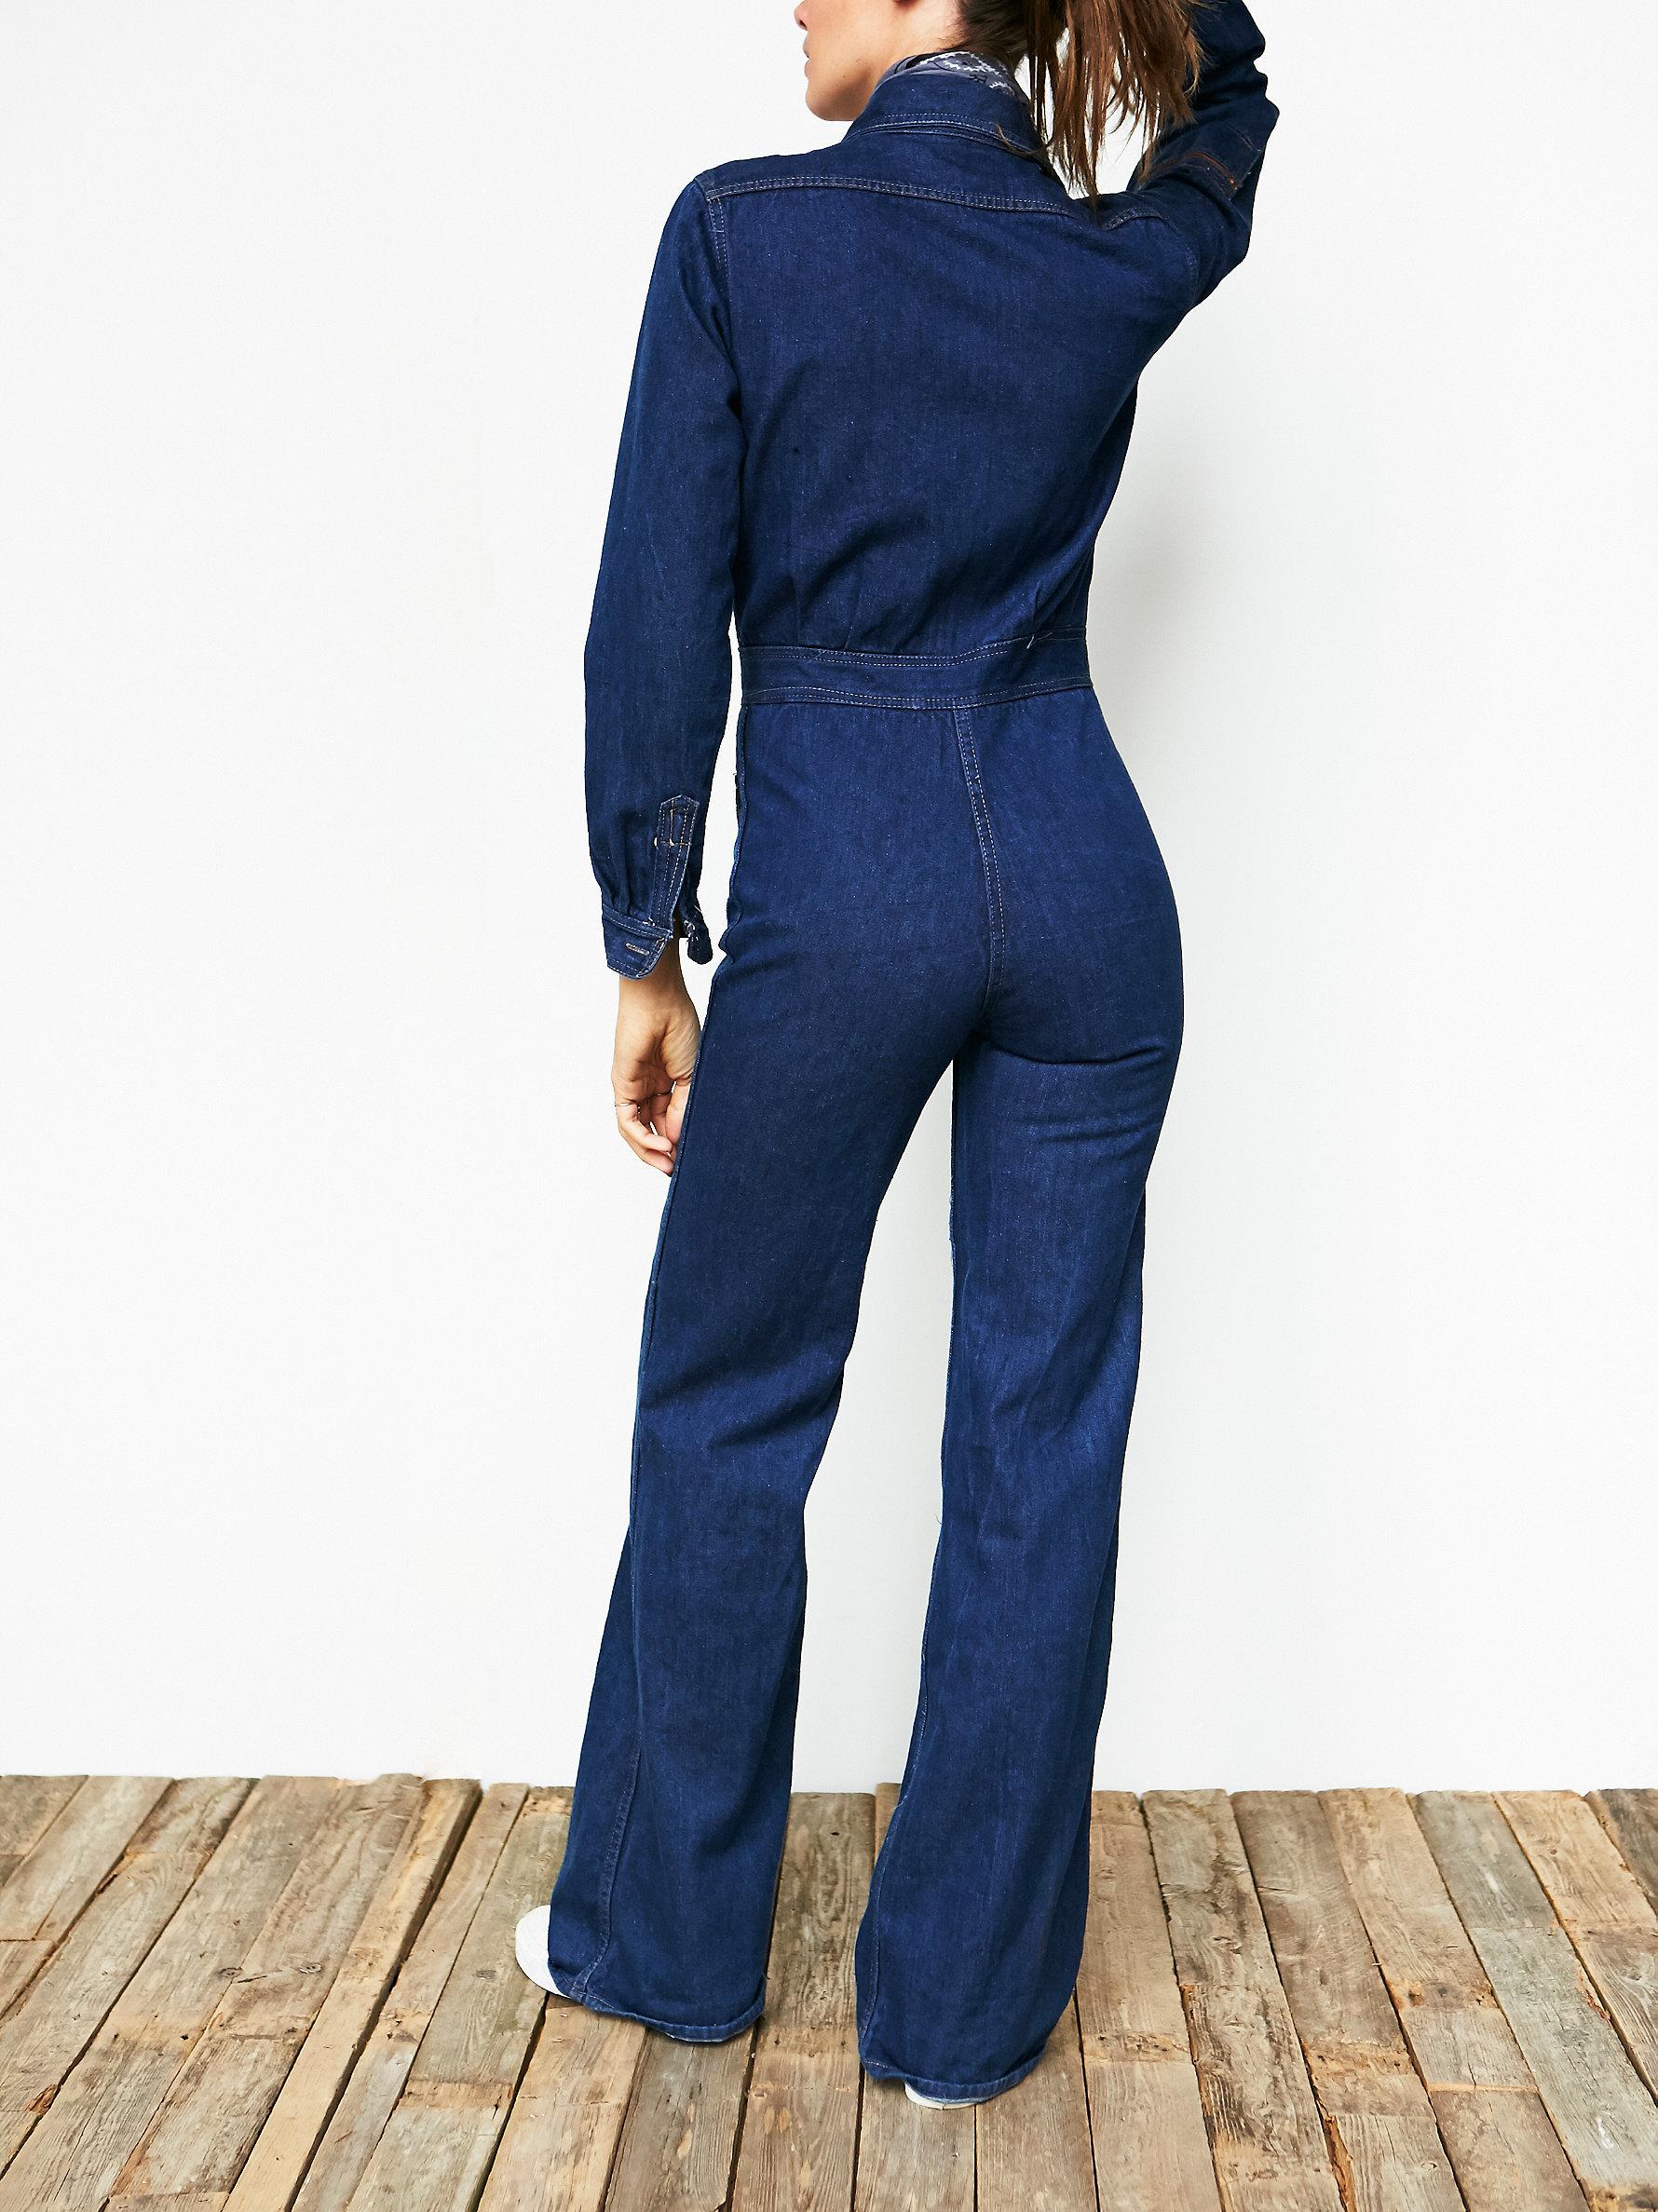 91eac94b4a3 Lyst - Free People Vintage 1970s Denim Jumpsuit in Blue